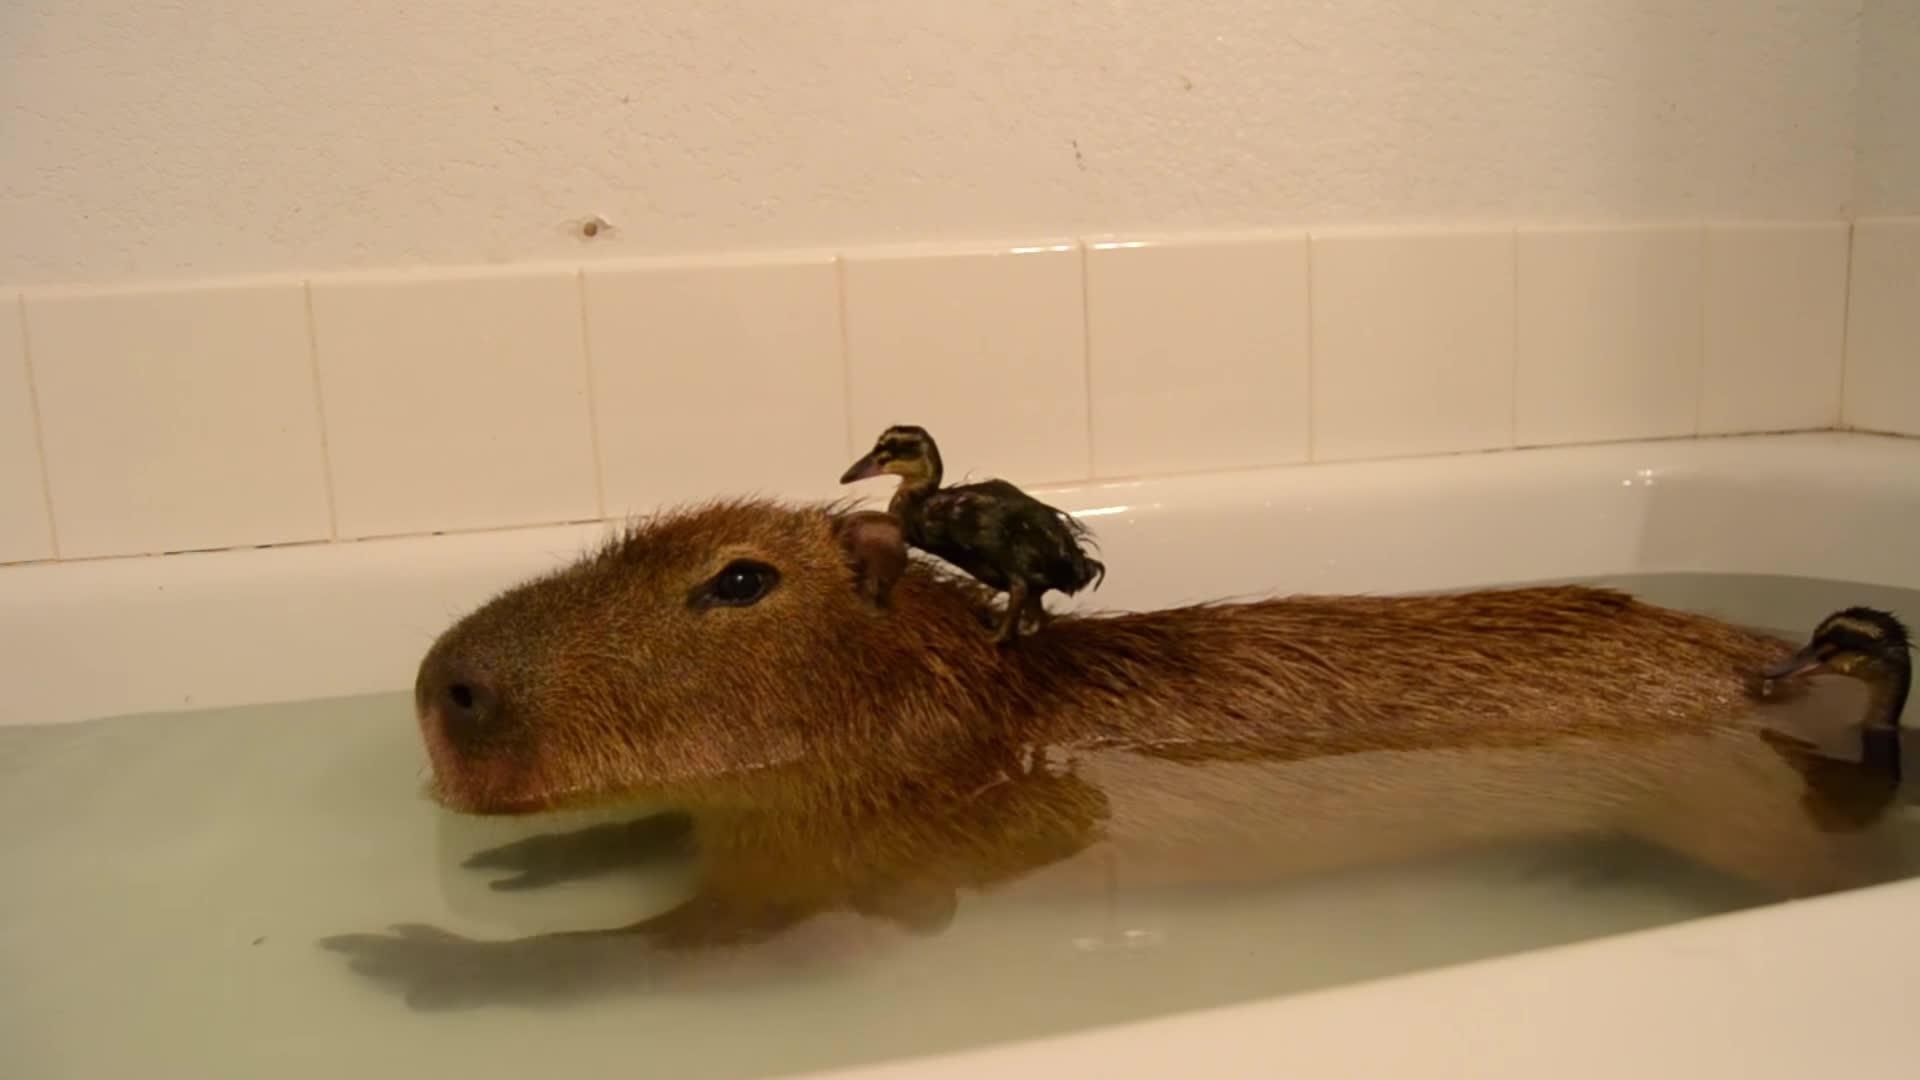 animals, awesome, capybara, crazy cody's creatures, ducks, joejoe the capybara, pets & animals, Enjoying bathtime with friends GIFs